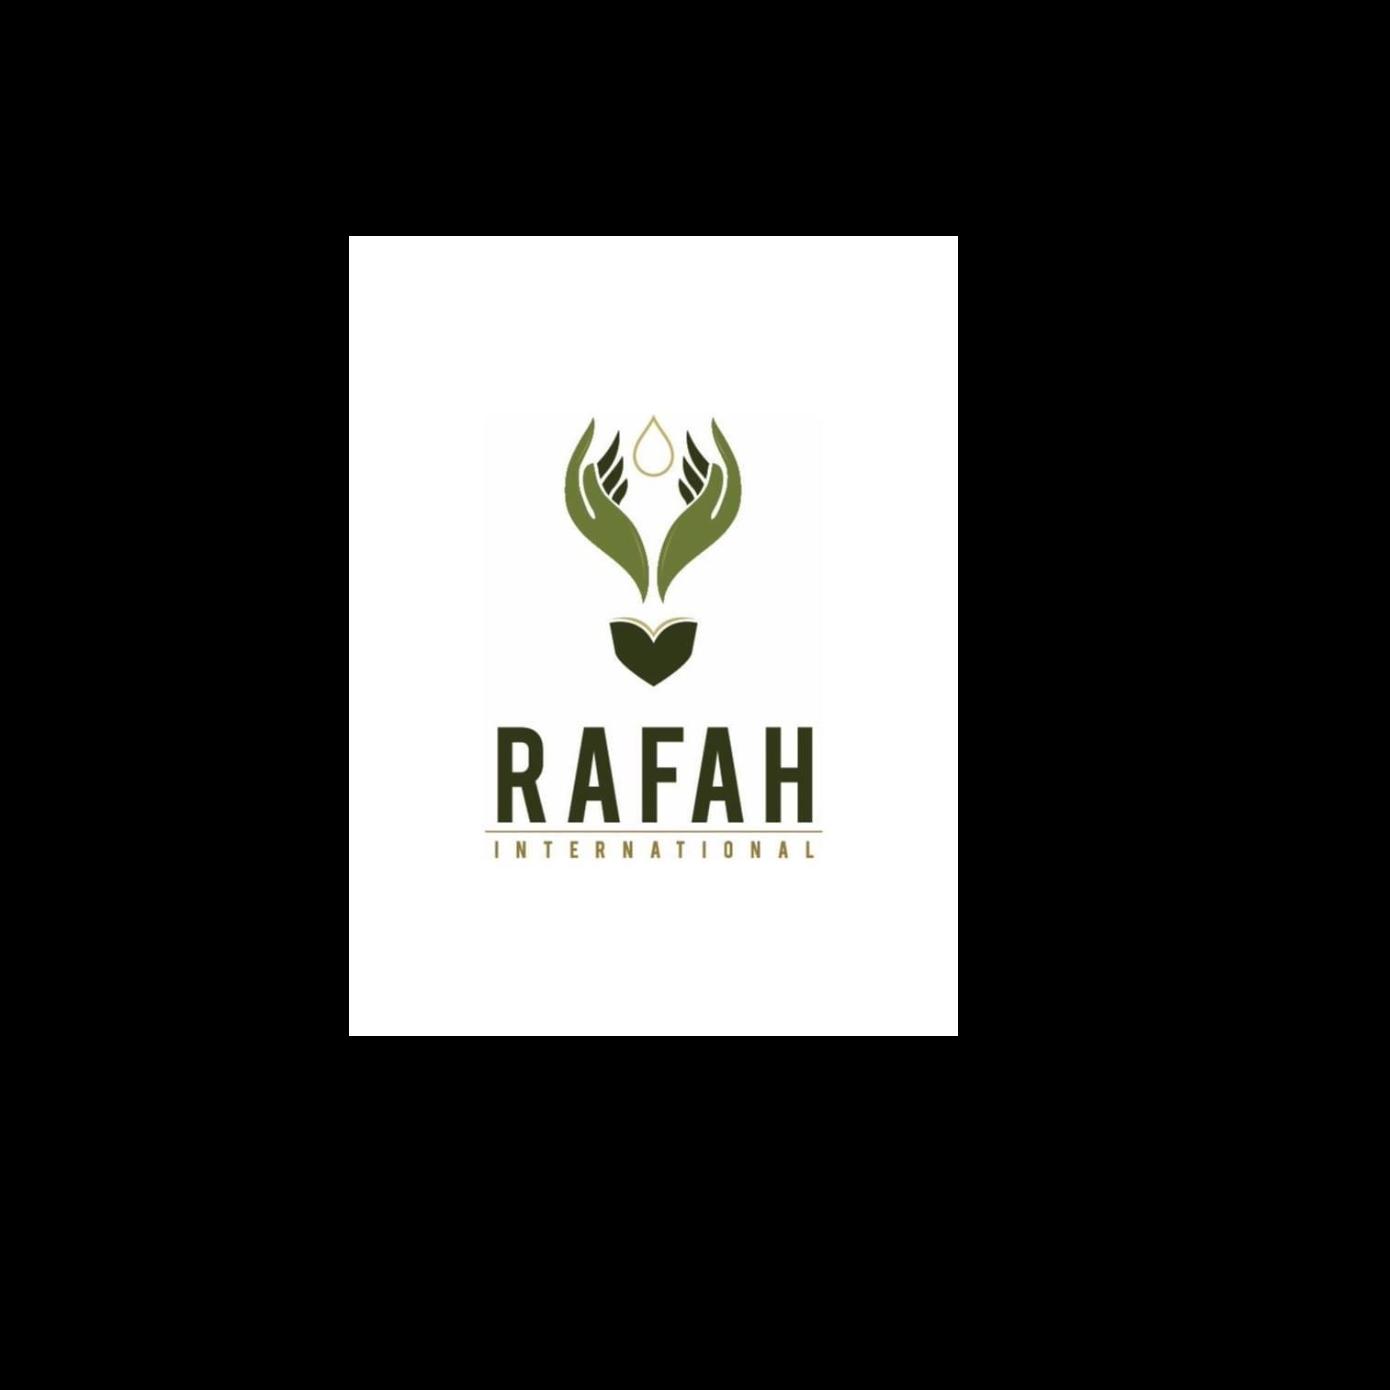 Rafah International